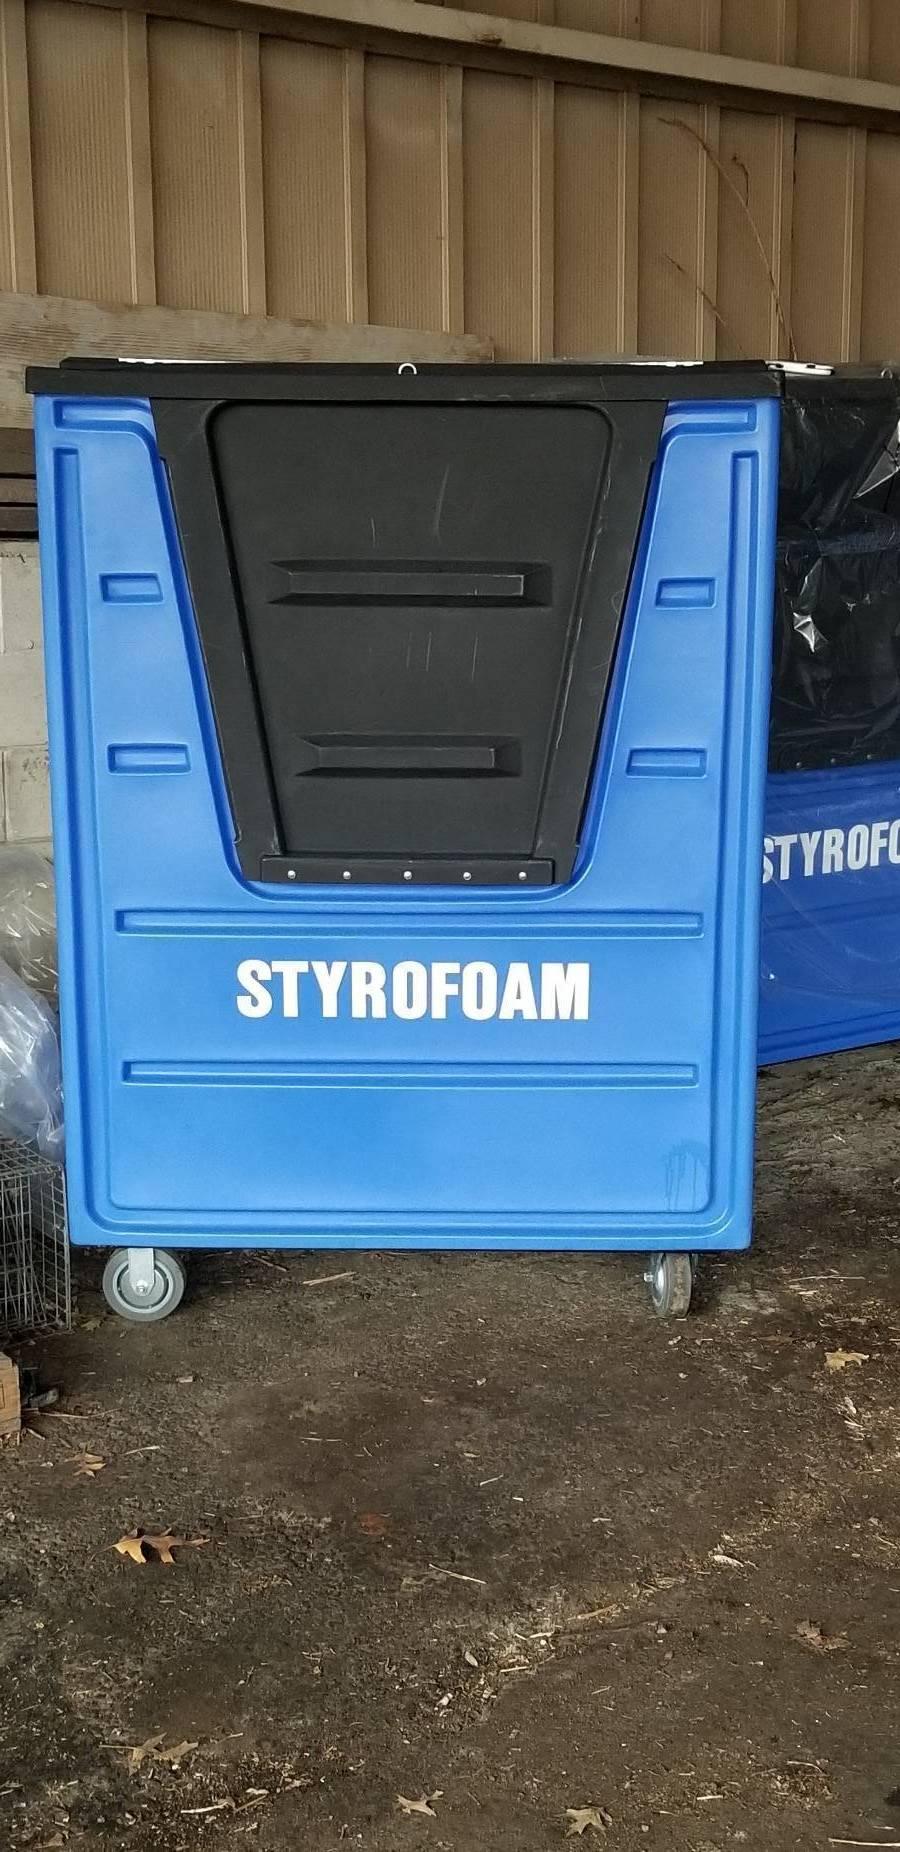 Styrofoam feb 27.jpg